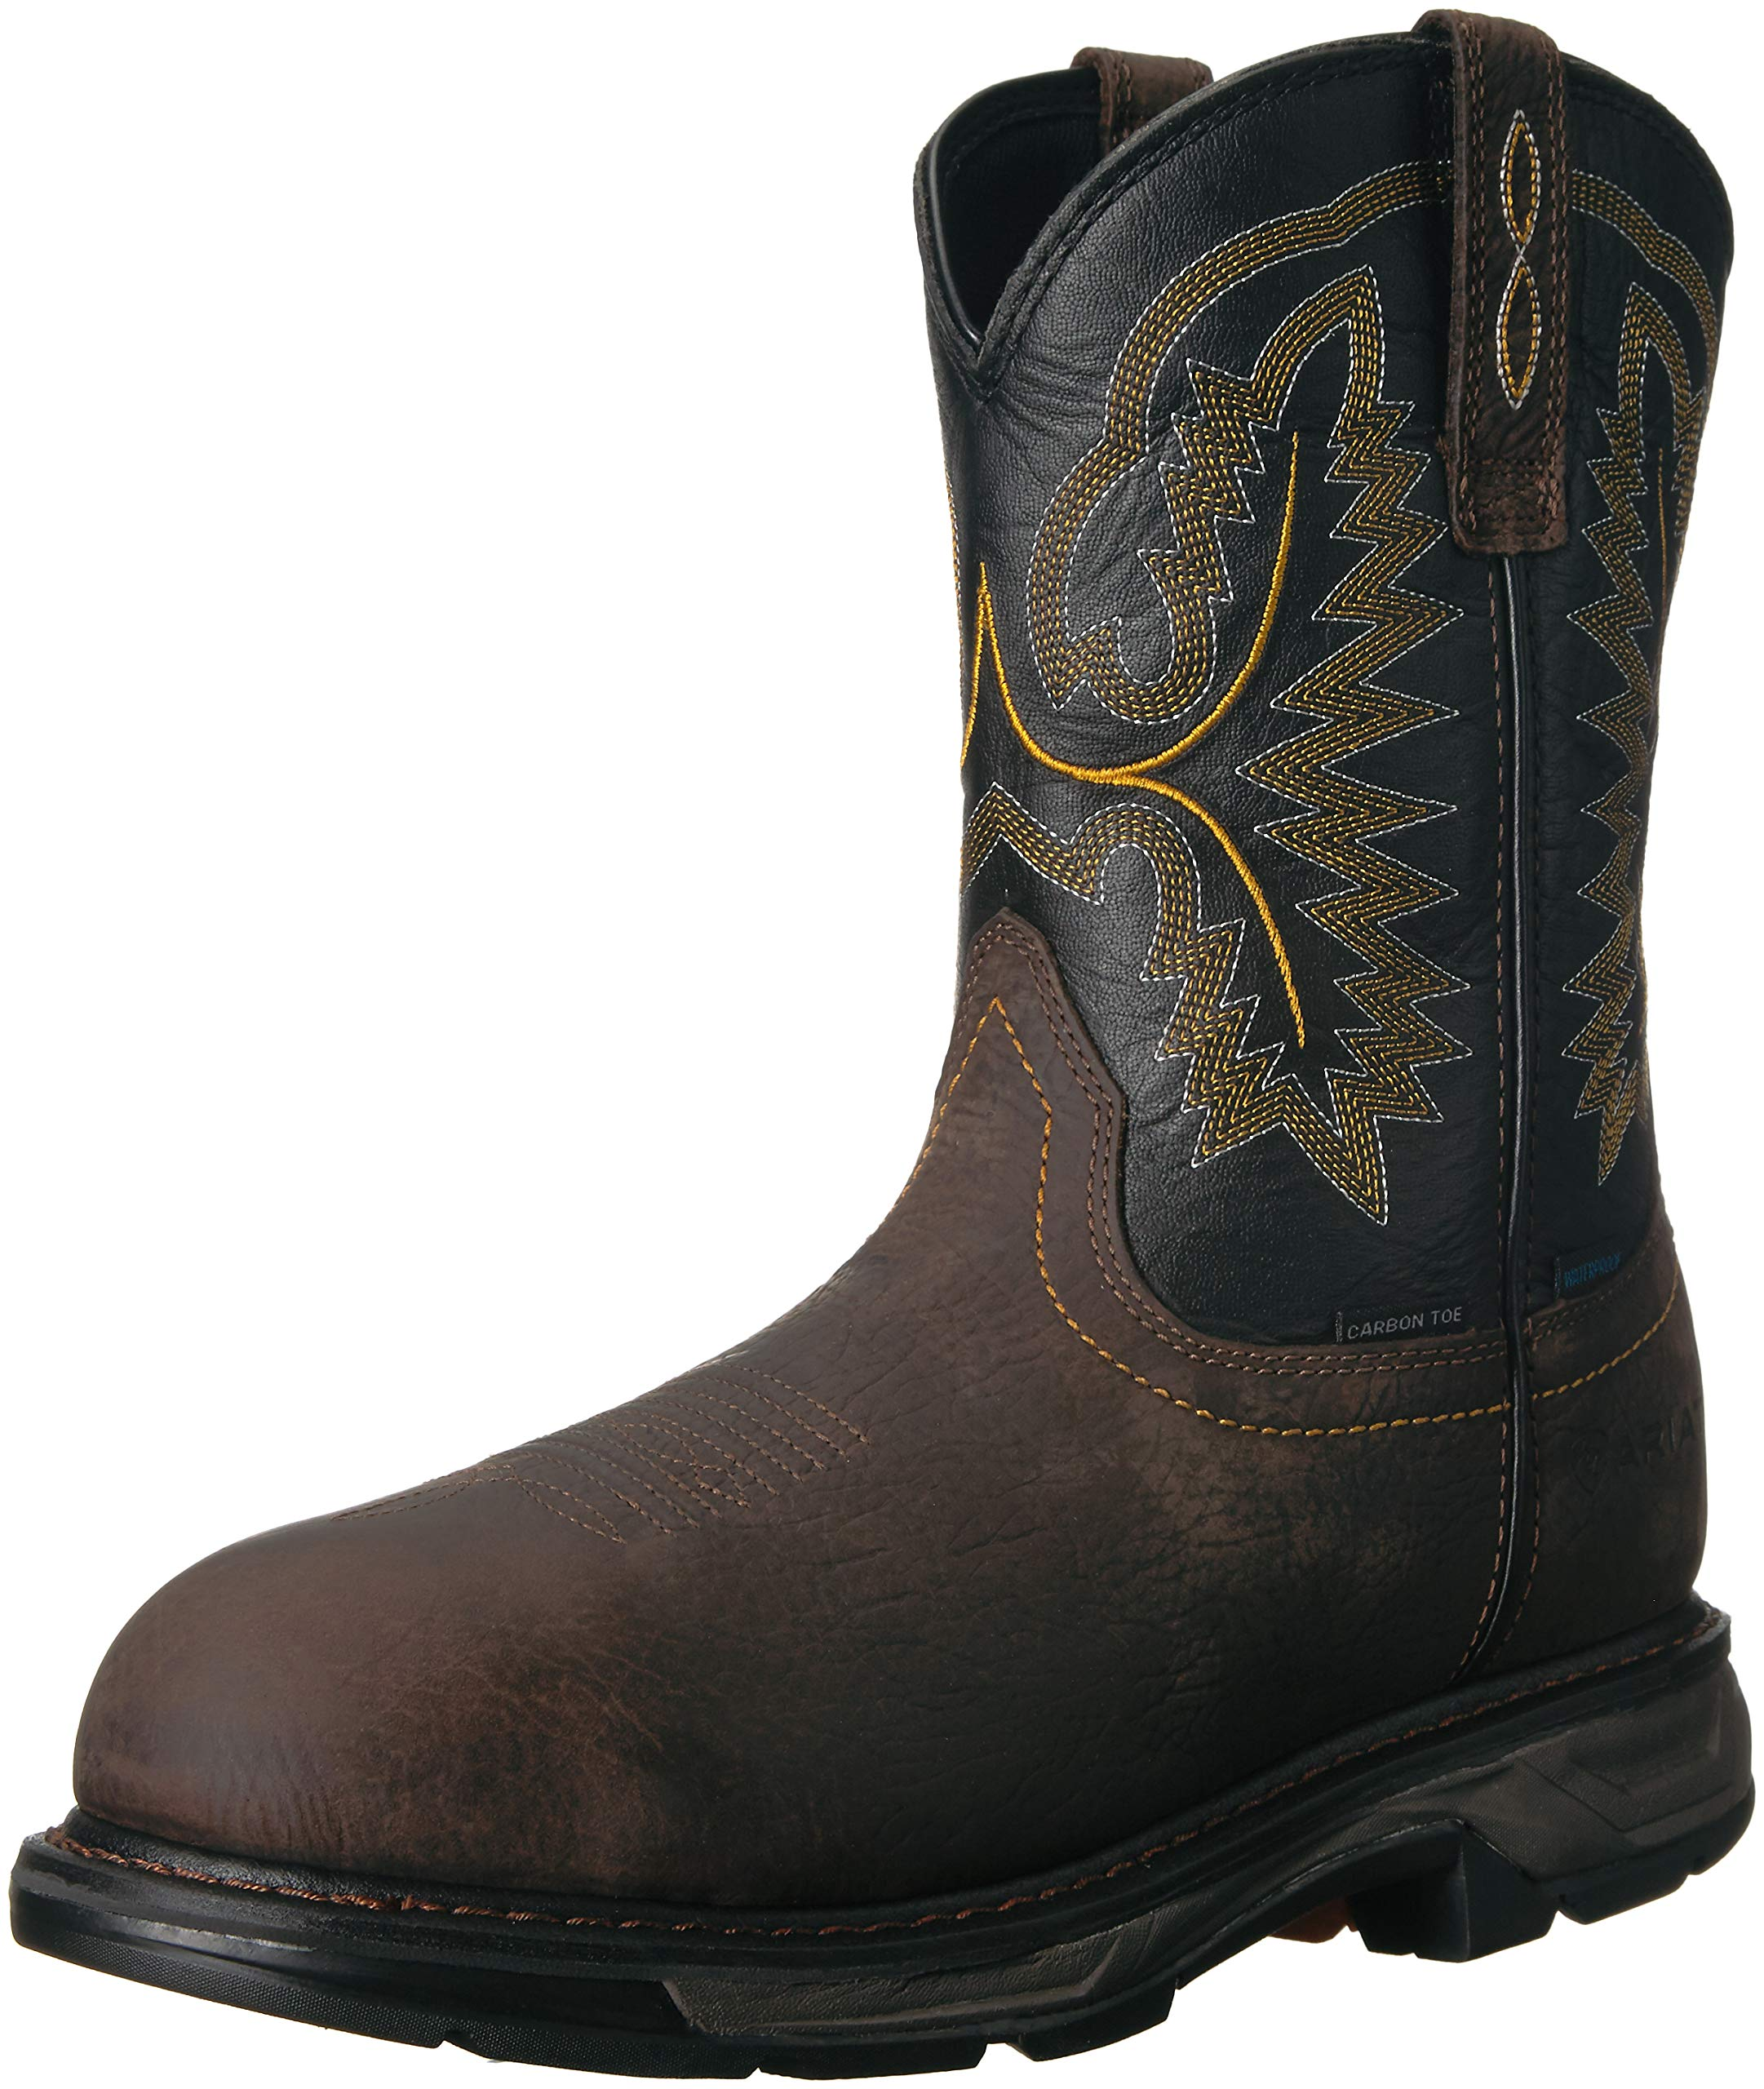 Ariat Work Men's EDGE LTE CHUKKA Composite Toe Boot